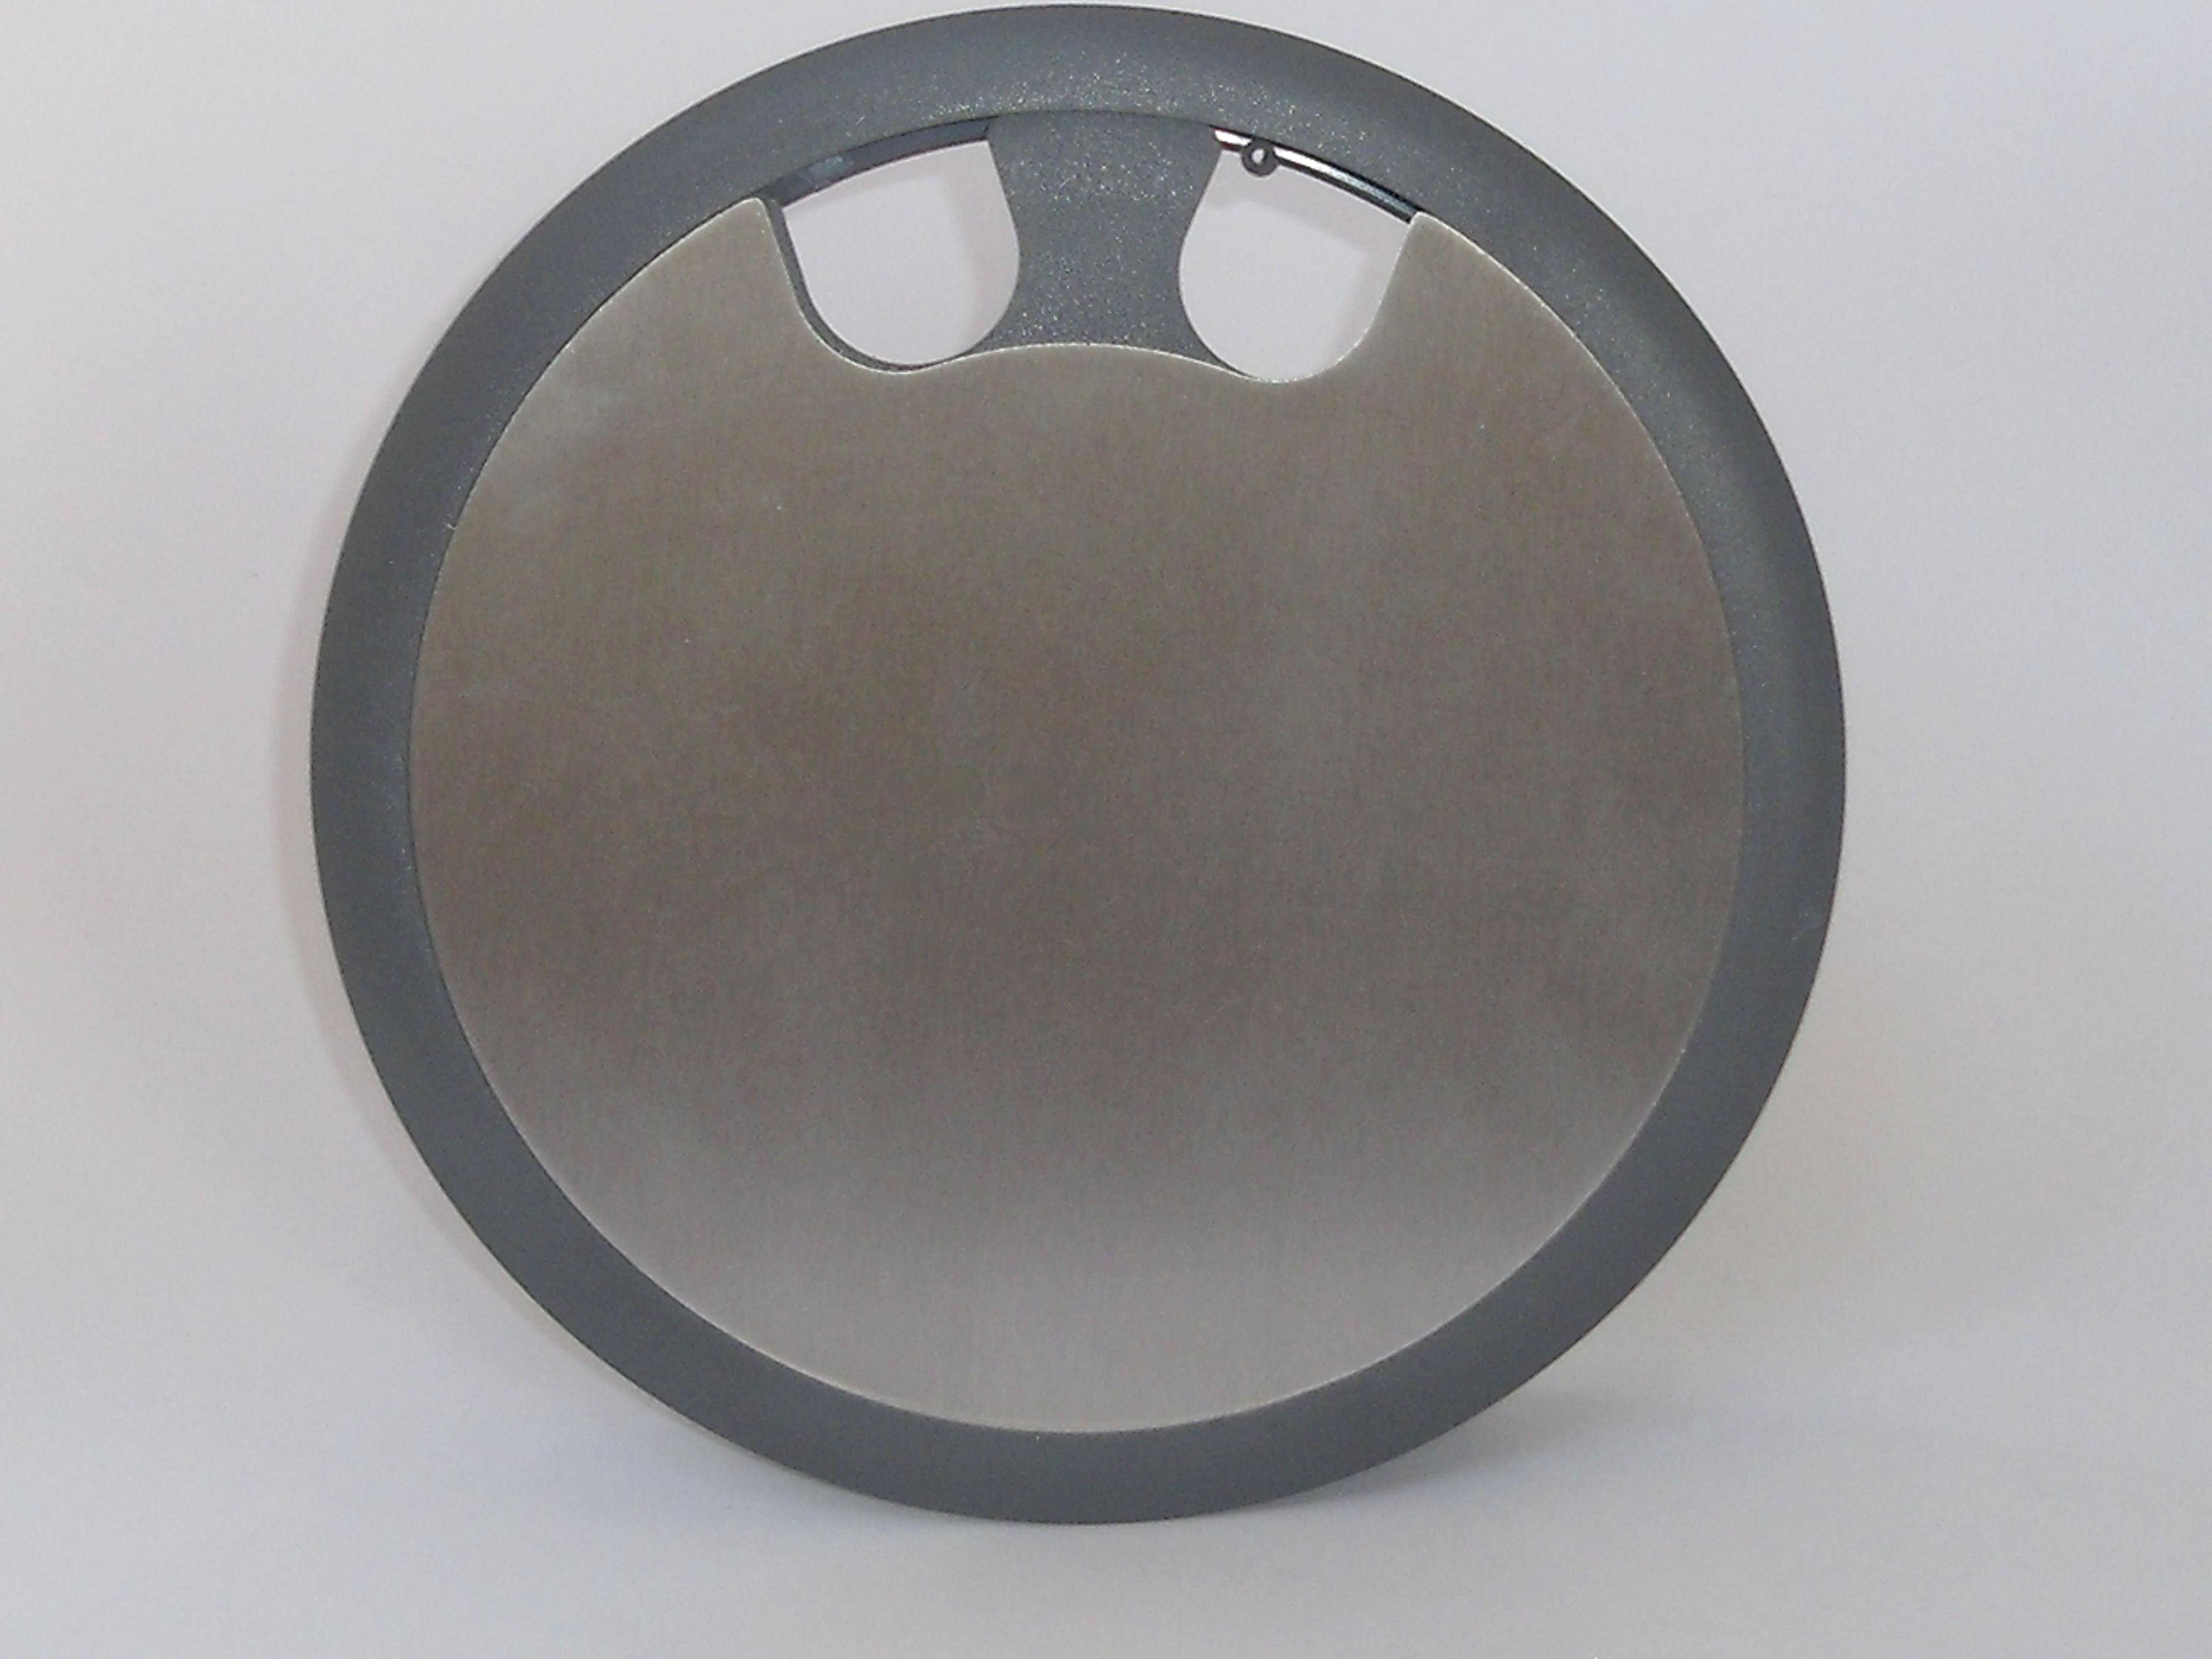 So085 Large Stainless Steel Lid Grommet Gromtec